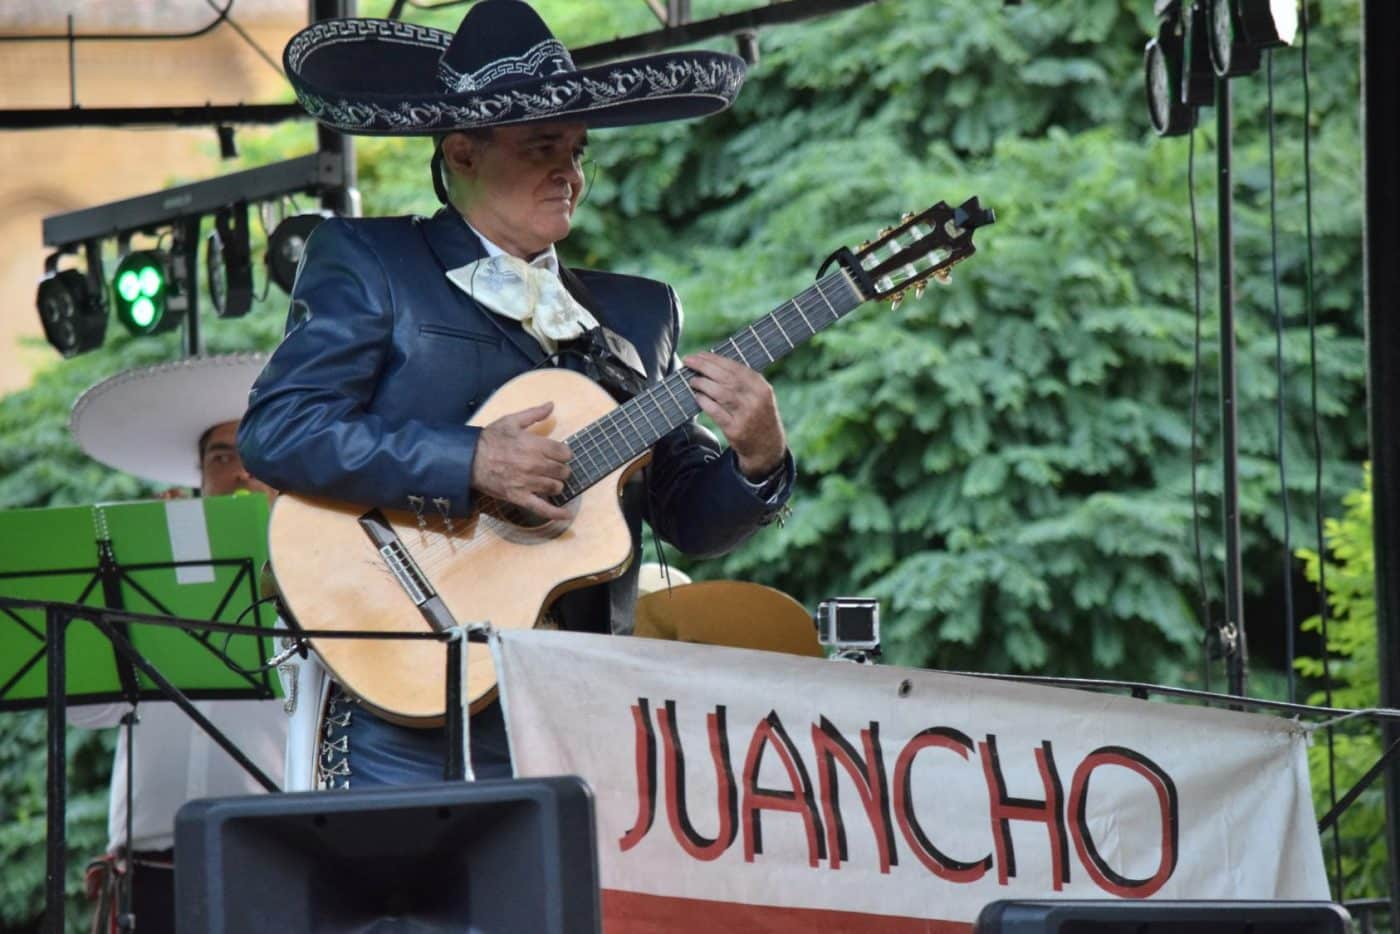 Juancho 'El Charro' encandila a Casalarreina 2